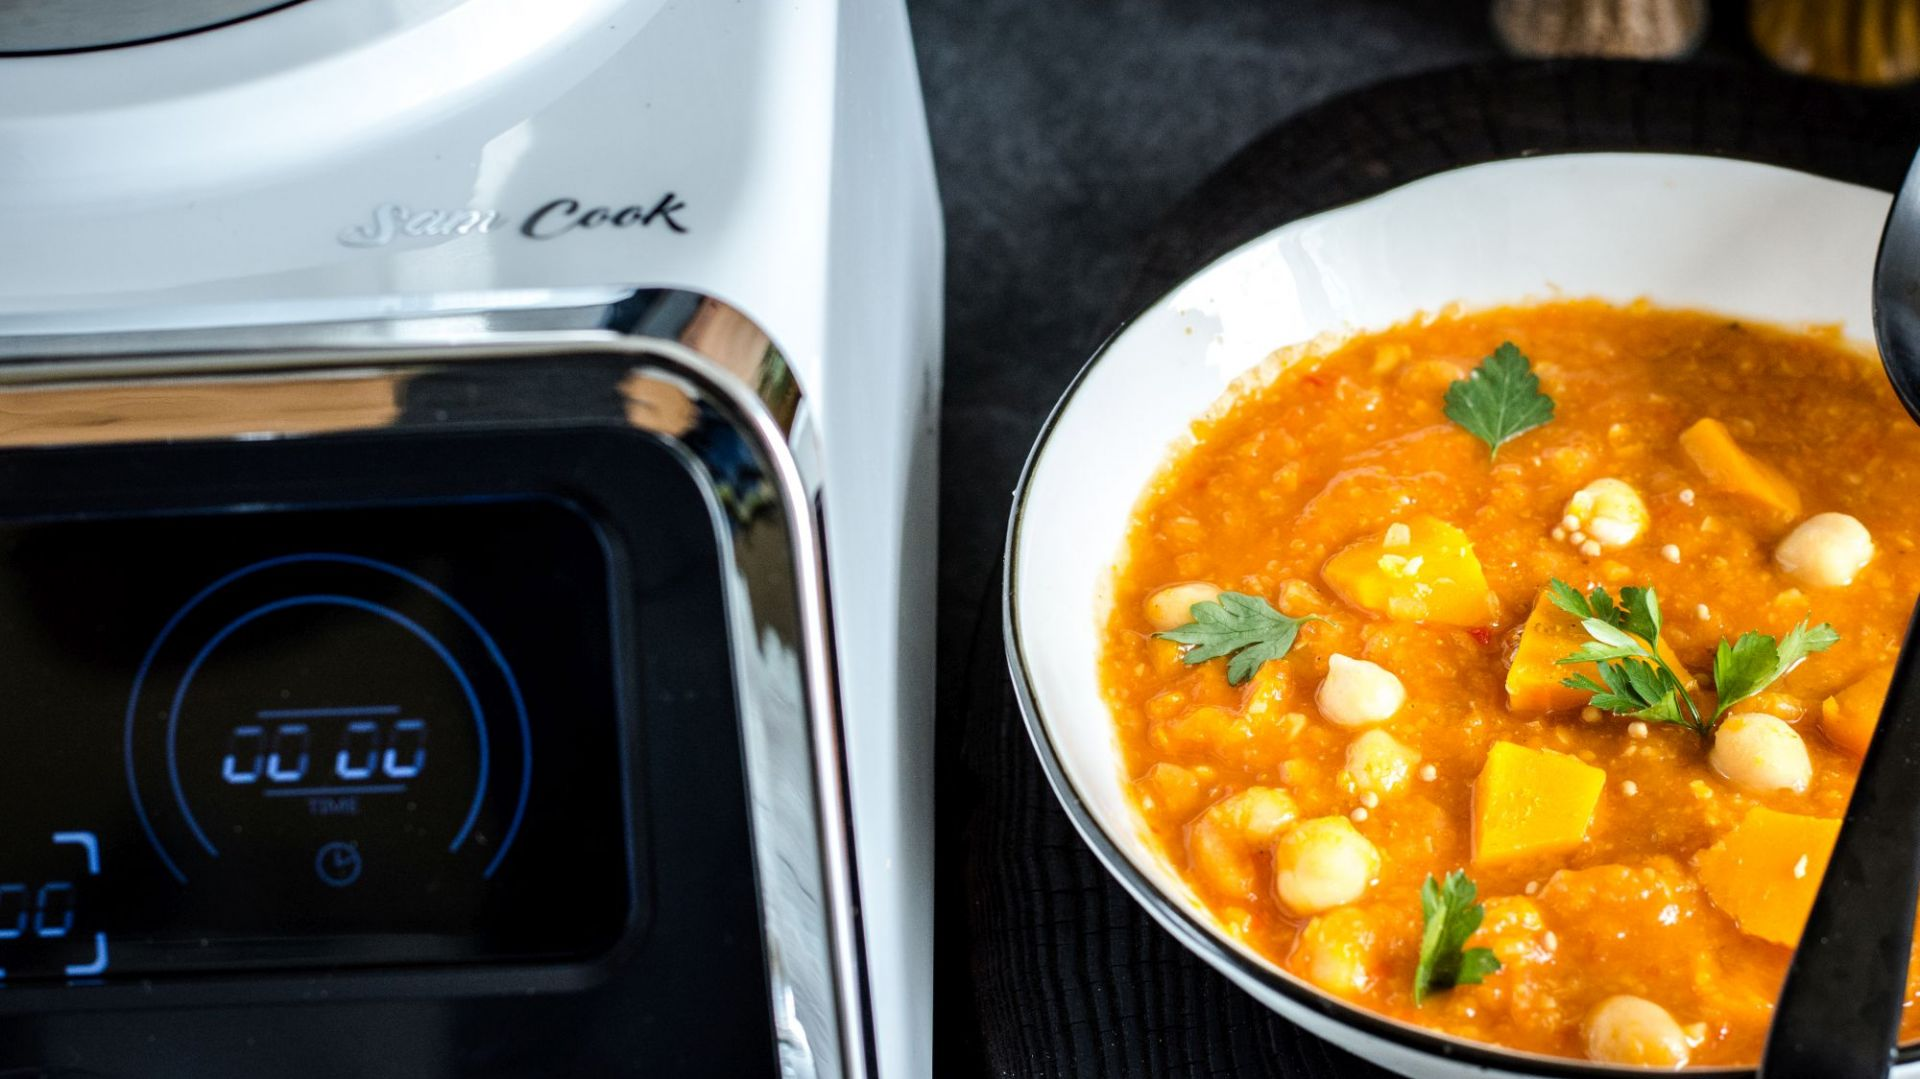 Gotowanie w kuchni - Termorobot. Fot. Sam Cook